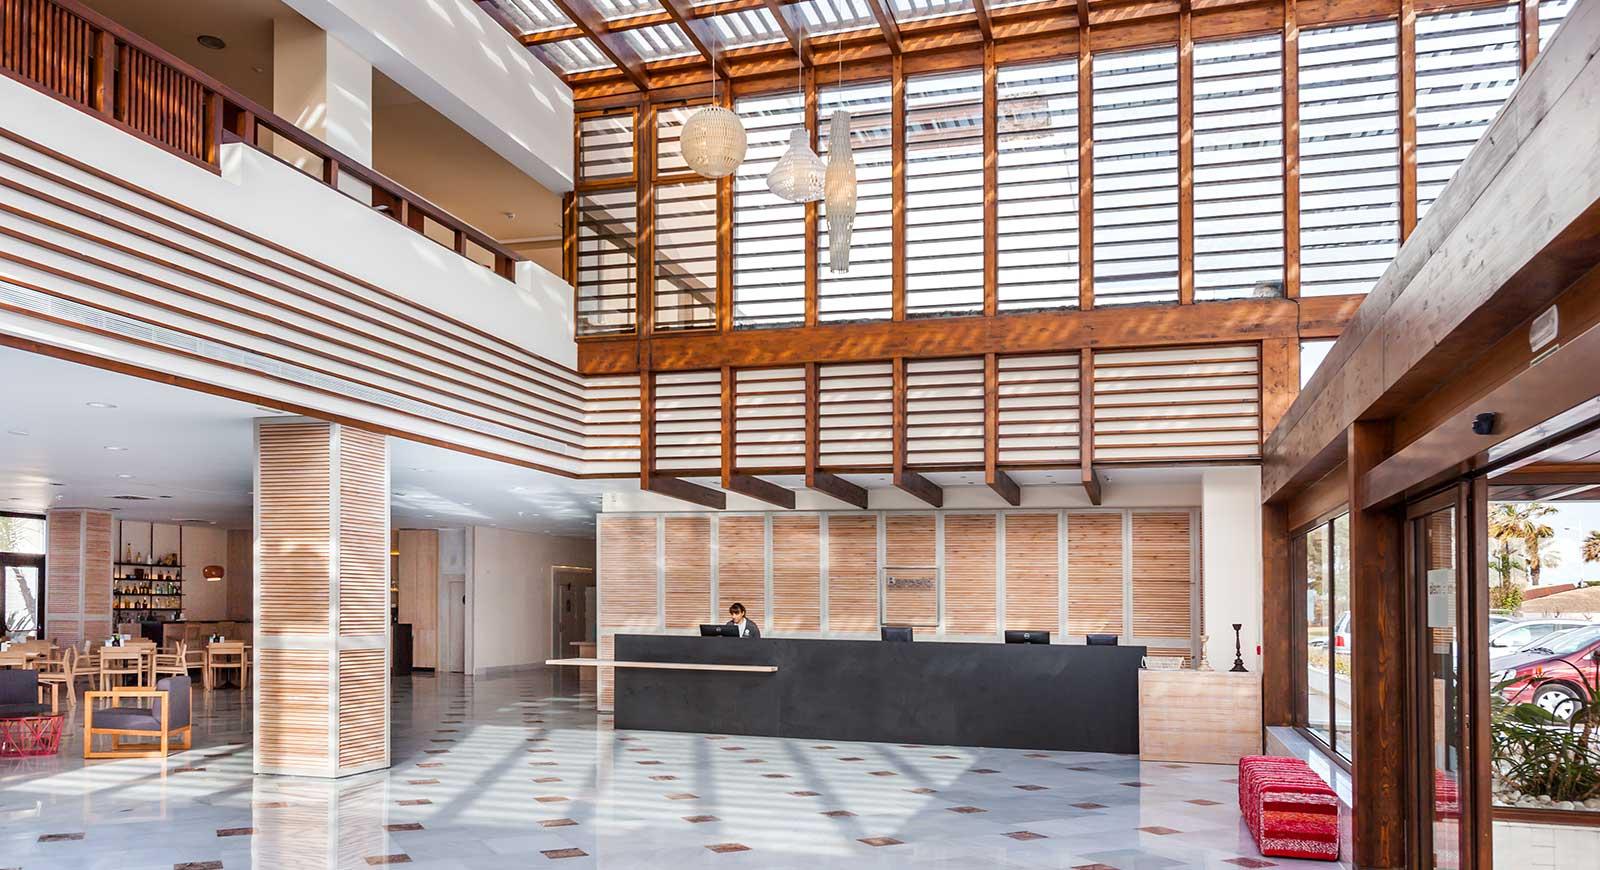 236-facilities-11-hotel-barcelo-cabo-de-gata_tcm20-8441_w1600_h870_n.jpg